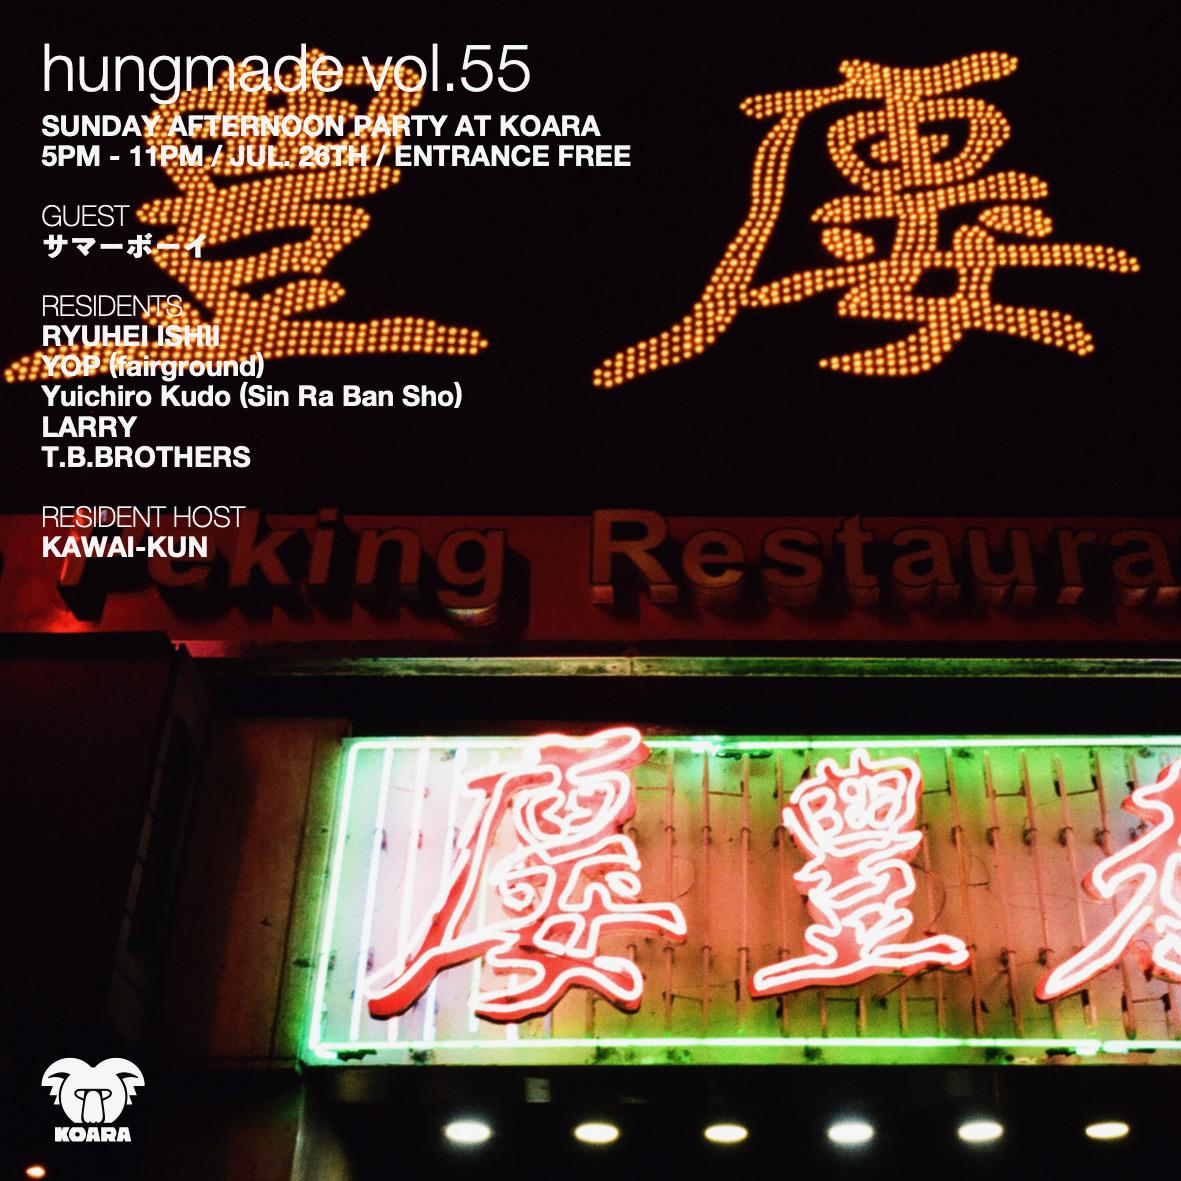 hungmade vol.55